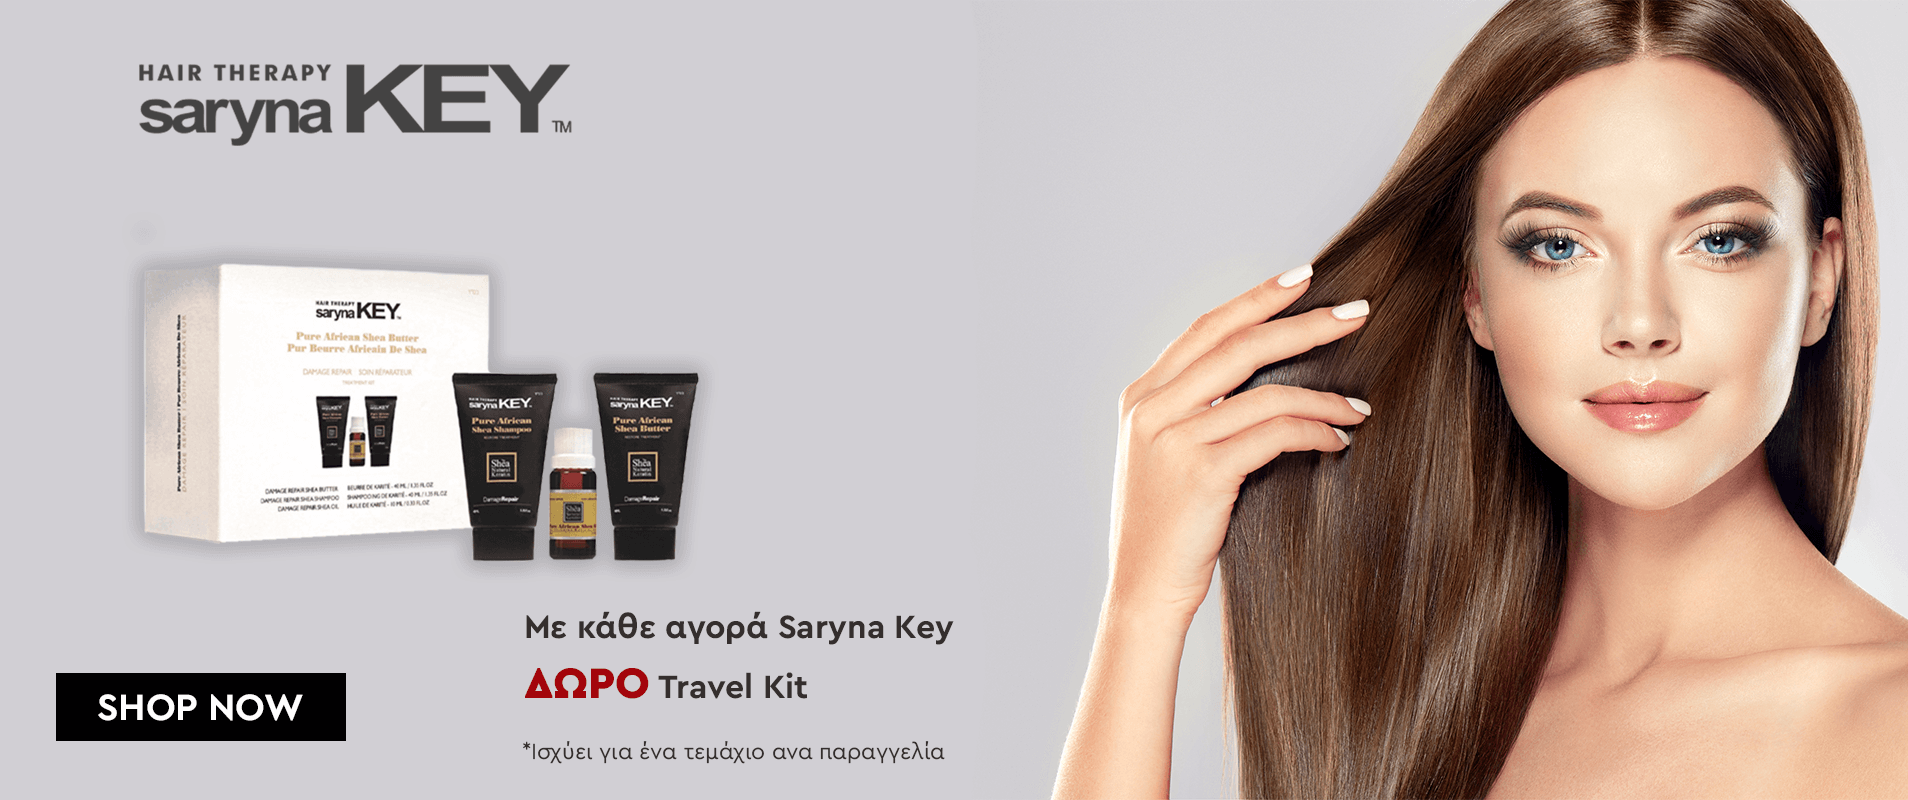 saryna-key-doro-travel-kit-kaizen-shop.png